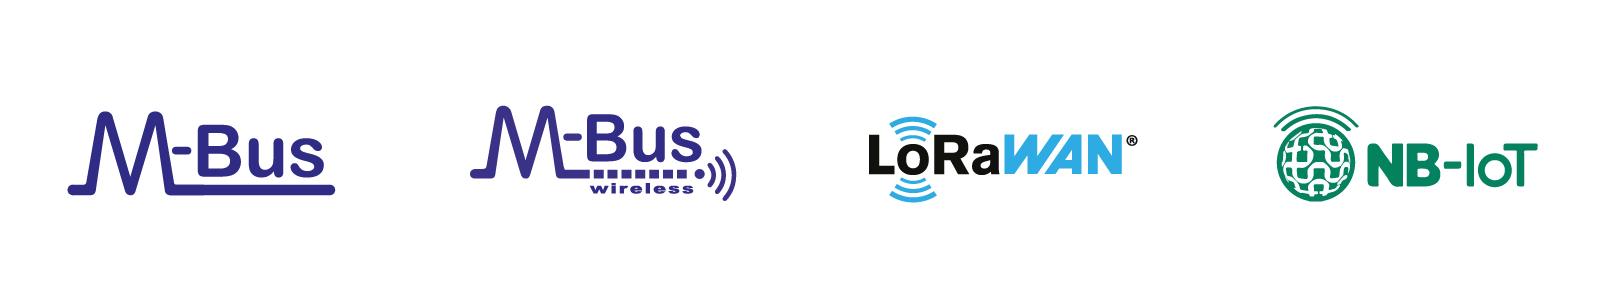 Orbit Connection Logos